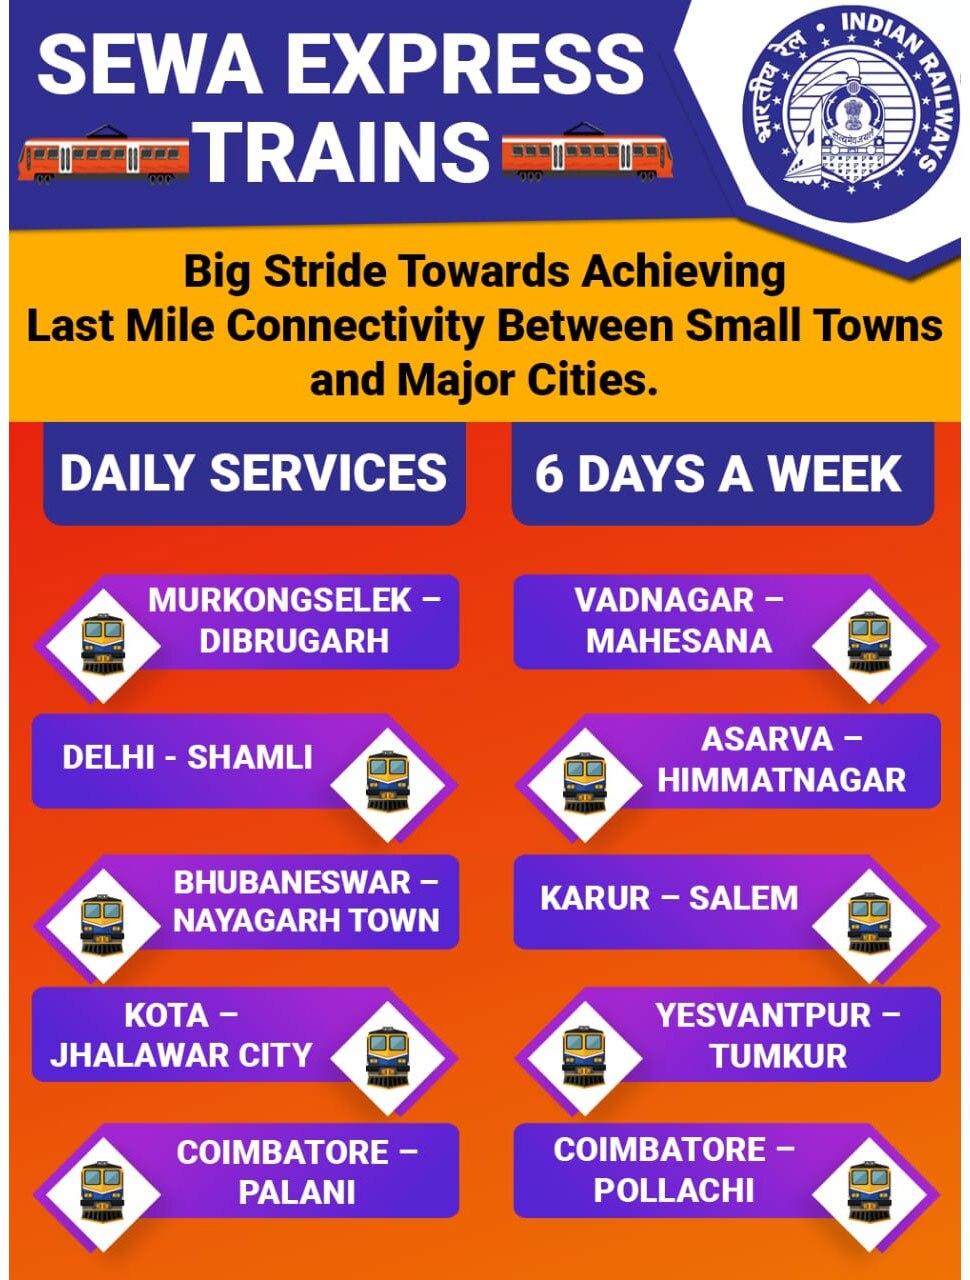 भारतीय रेलवे, Indian Railways, Sewa Express trains, 10 Sewa Express